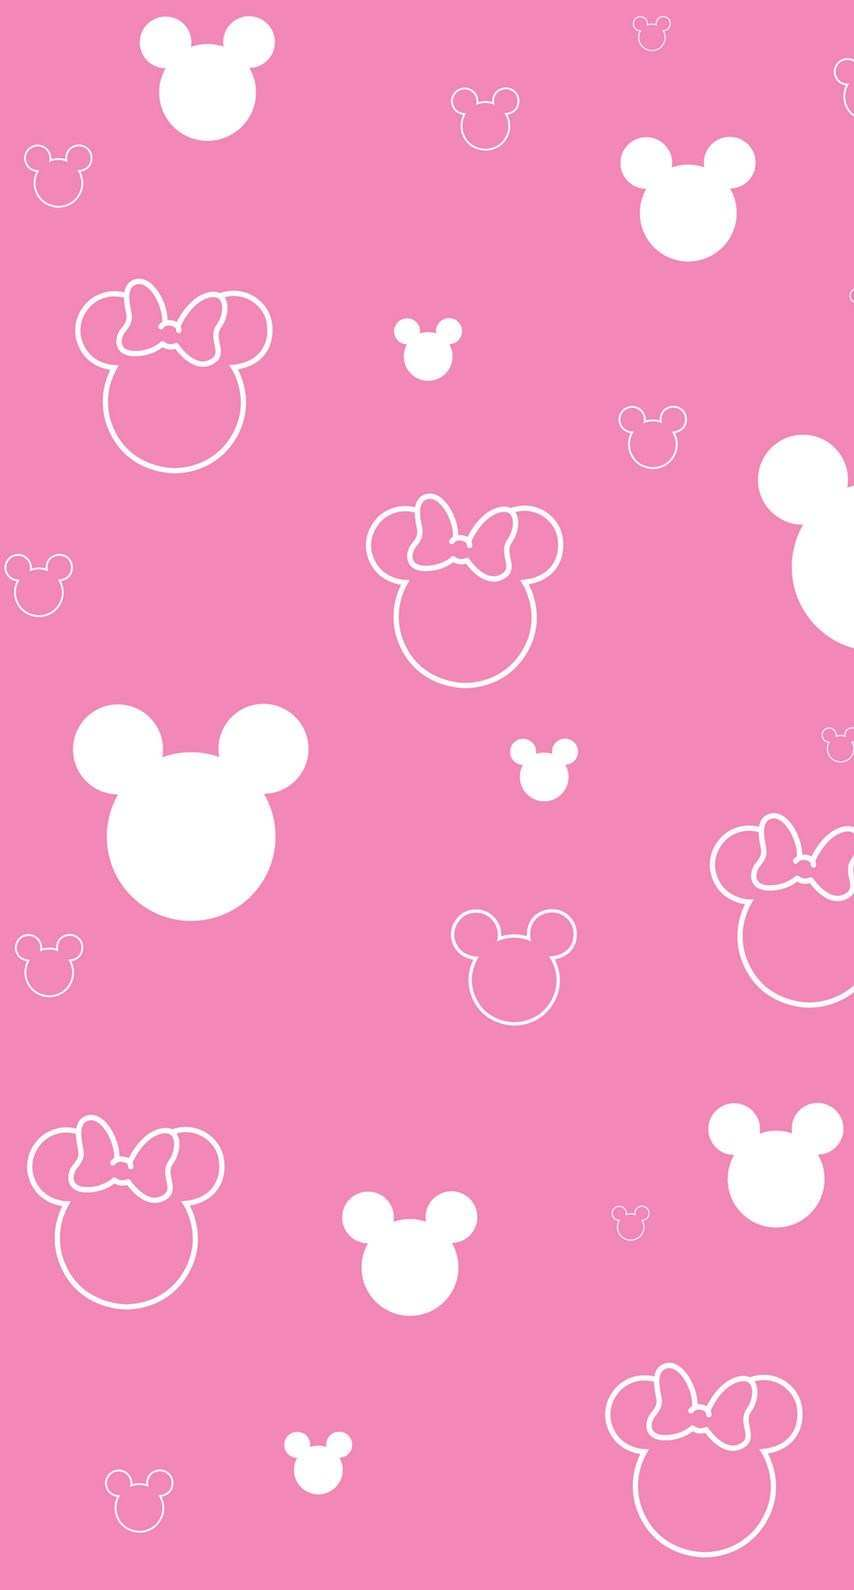 Wallpaper Lucu Tumblr Iphone Android Wallpaper Minnie